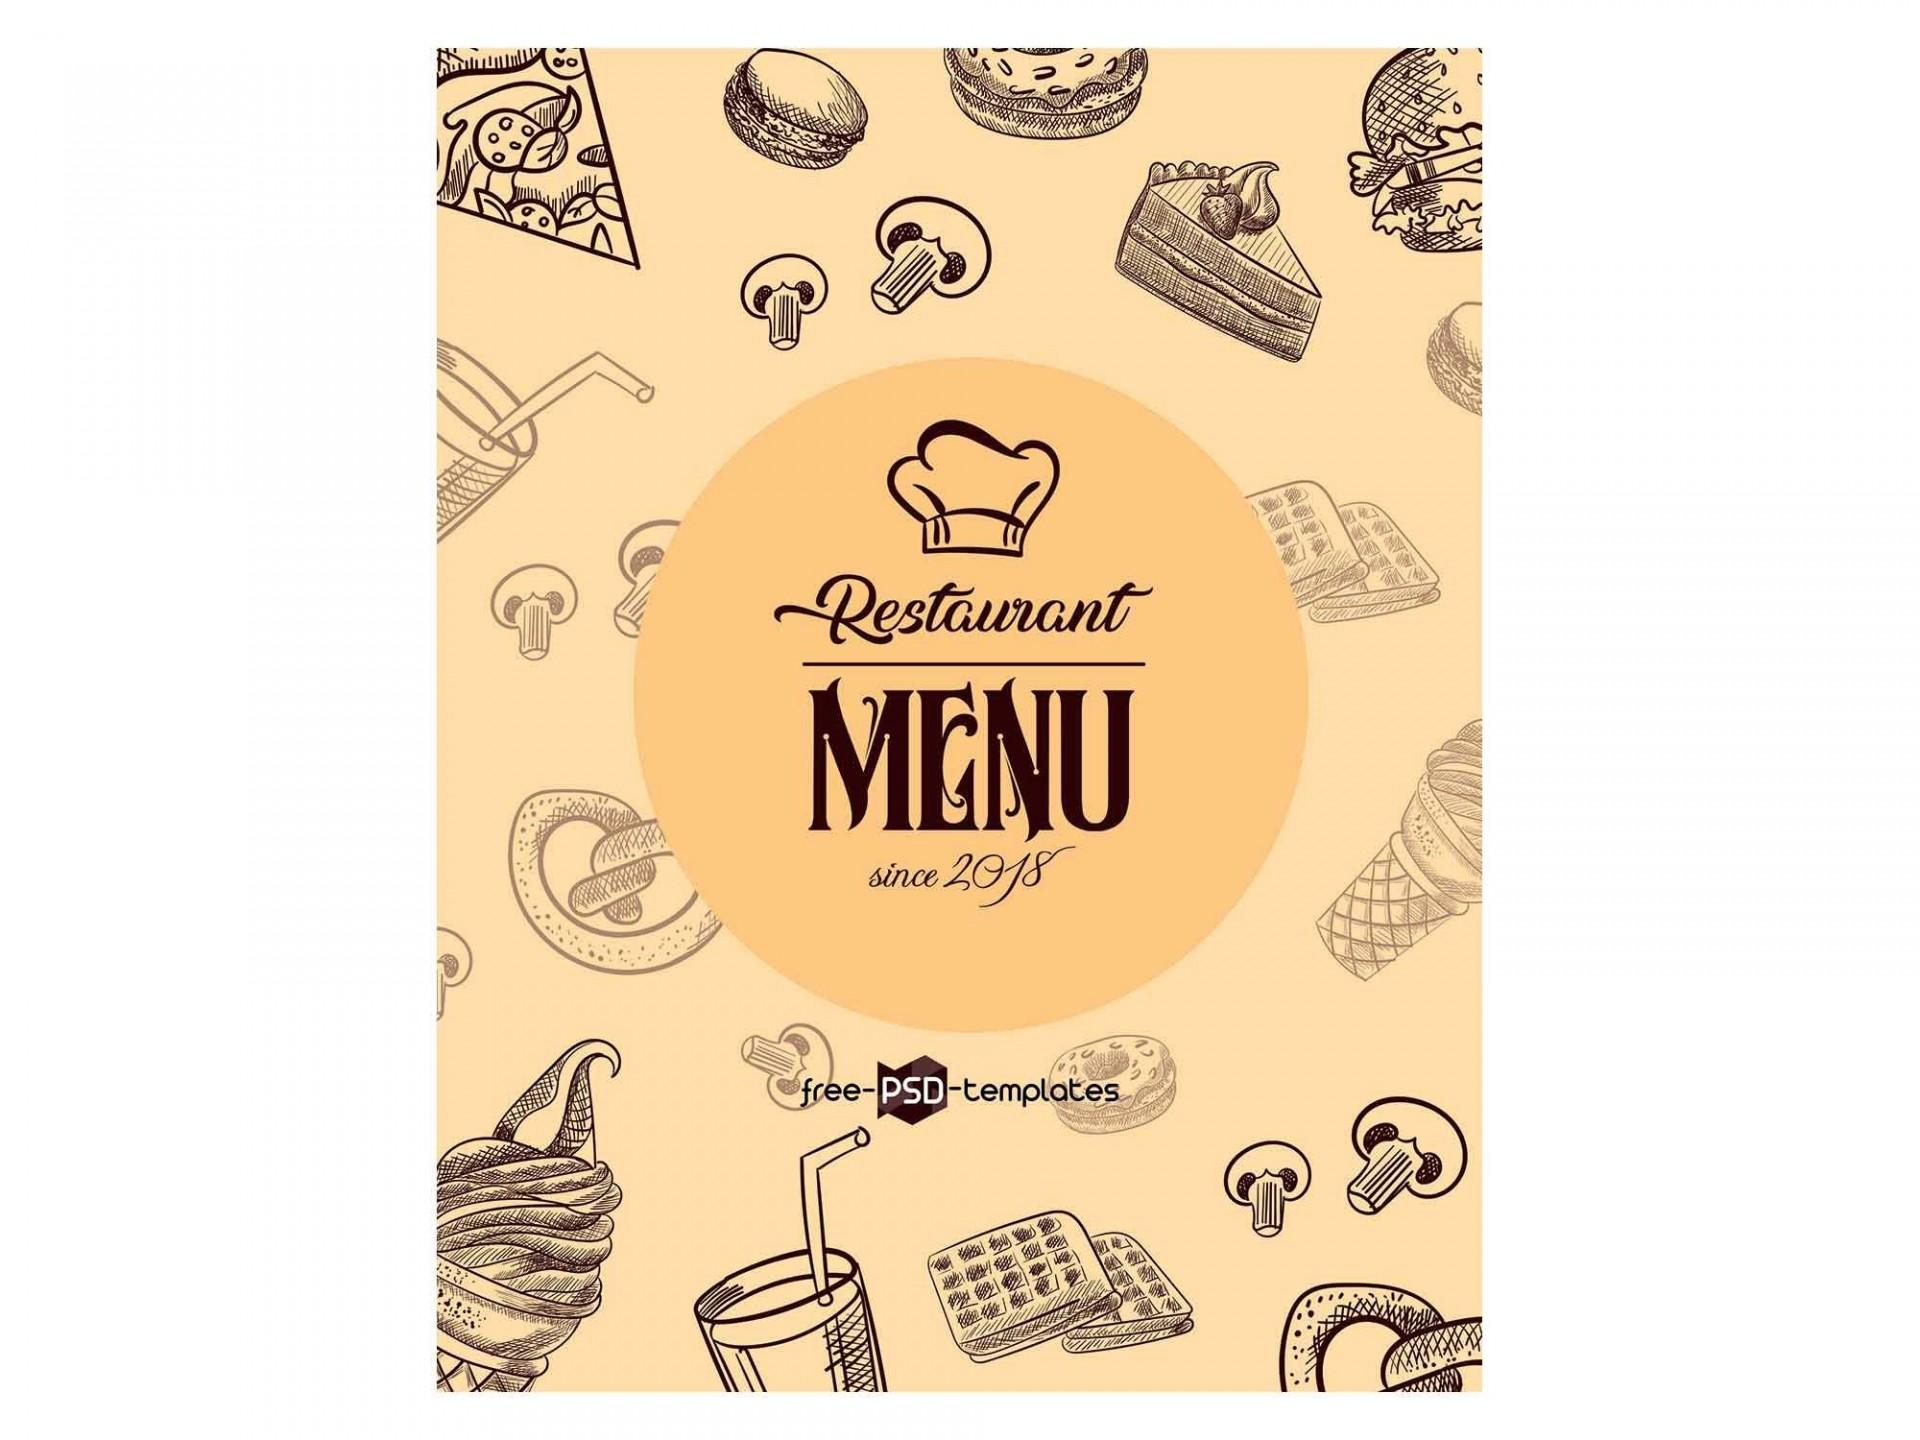 007 Magnificent Restaurant Menu Template Free Download Psd Highest Clarity  Design1920